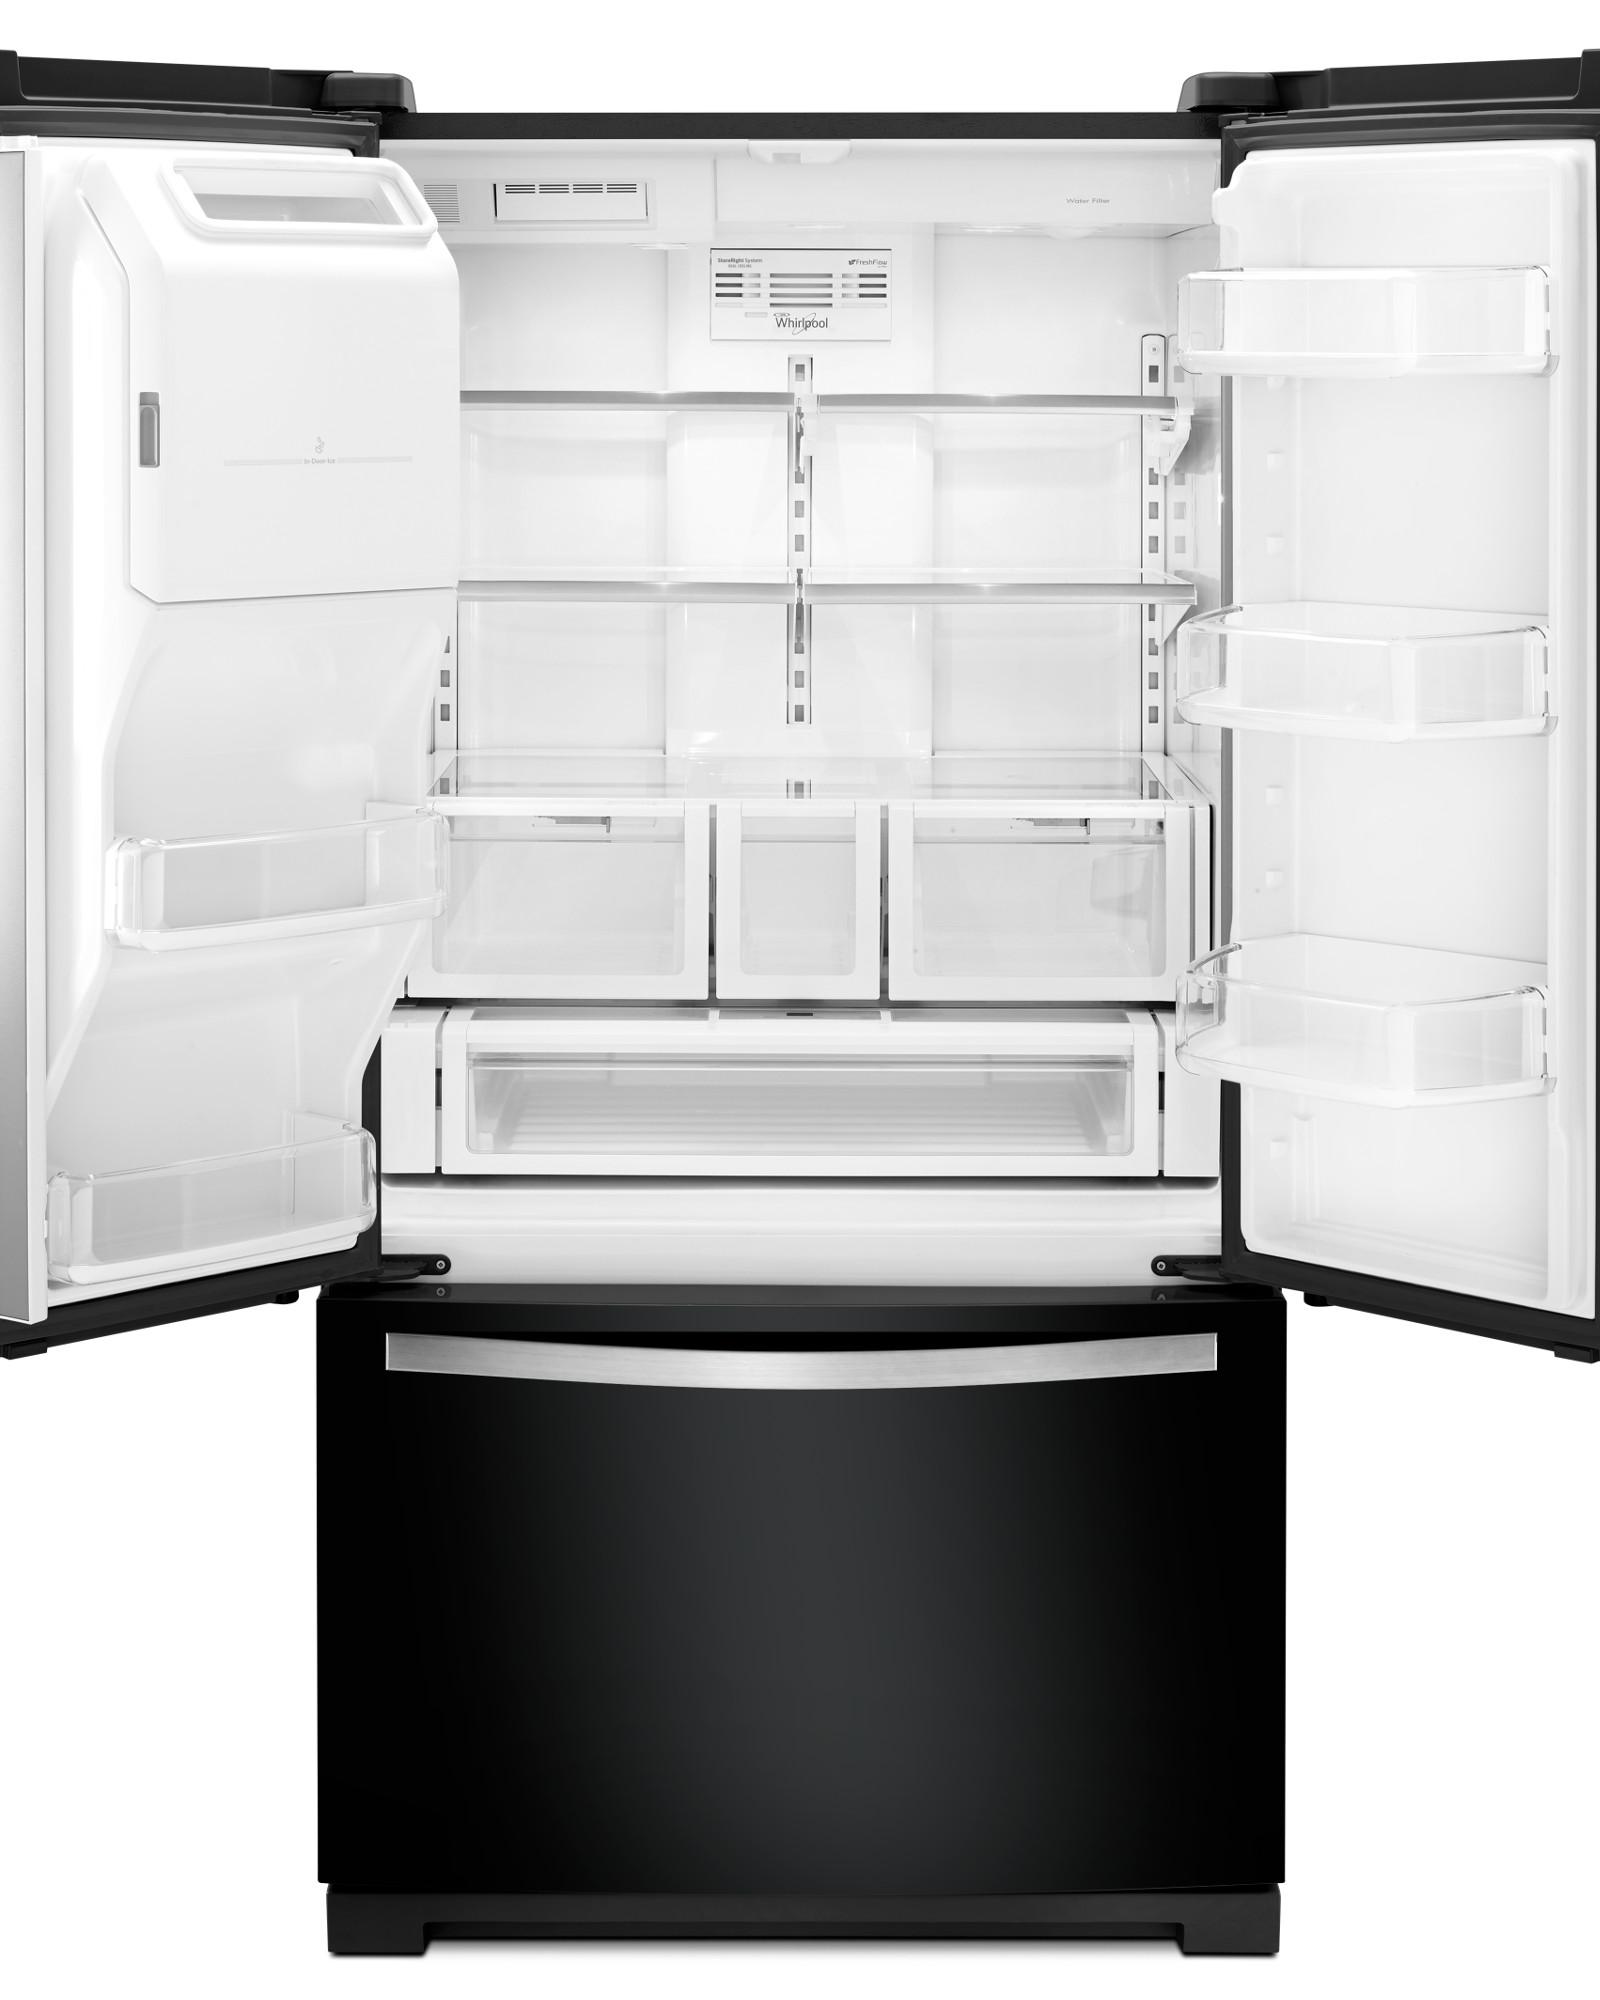 Whirlpool WRF757SDEE 27 cu. ft. French Door Bottom-Freezer Refrigerator - Black